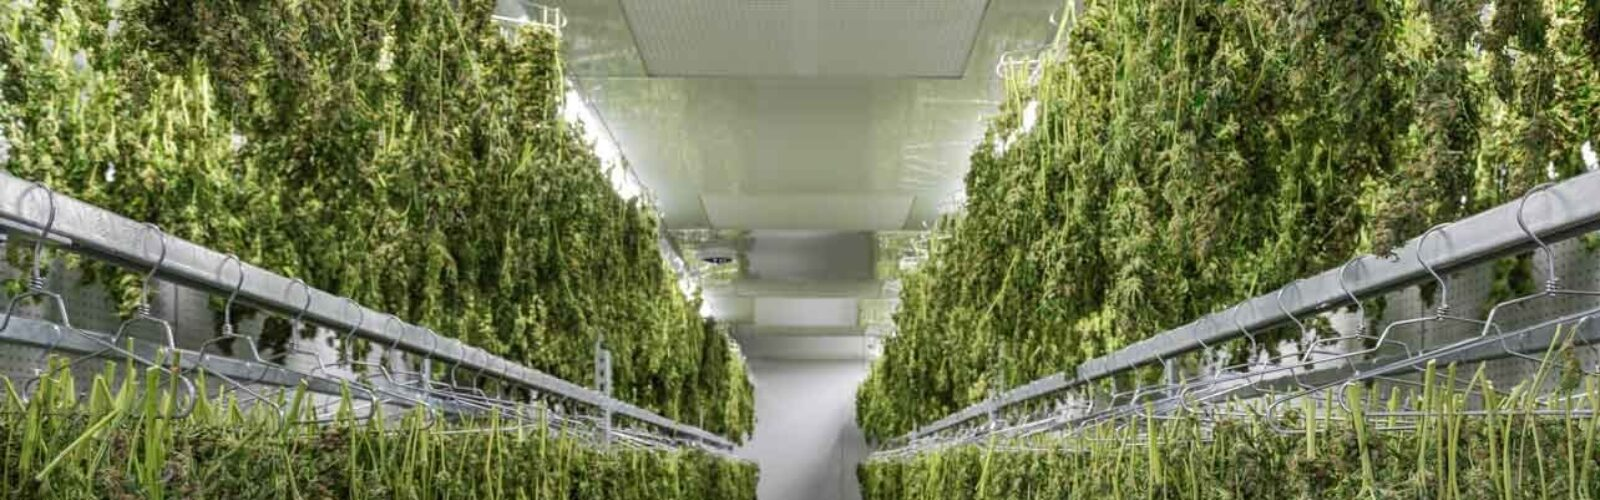 atlanticann-cannabis-drying-room 5